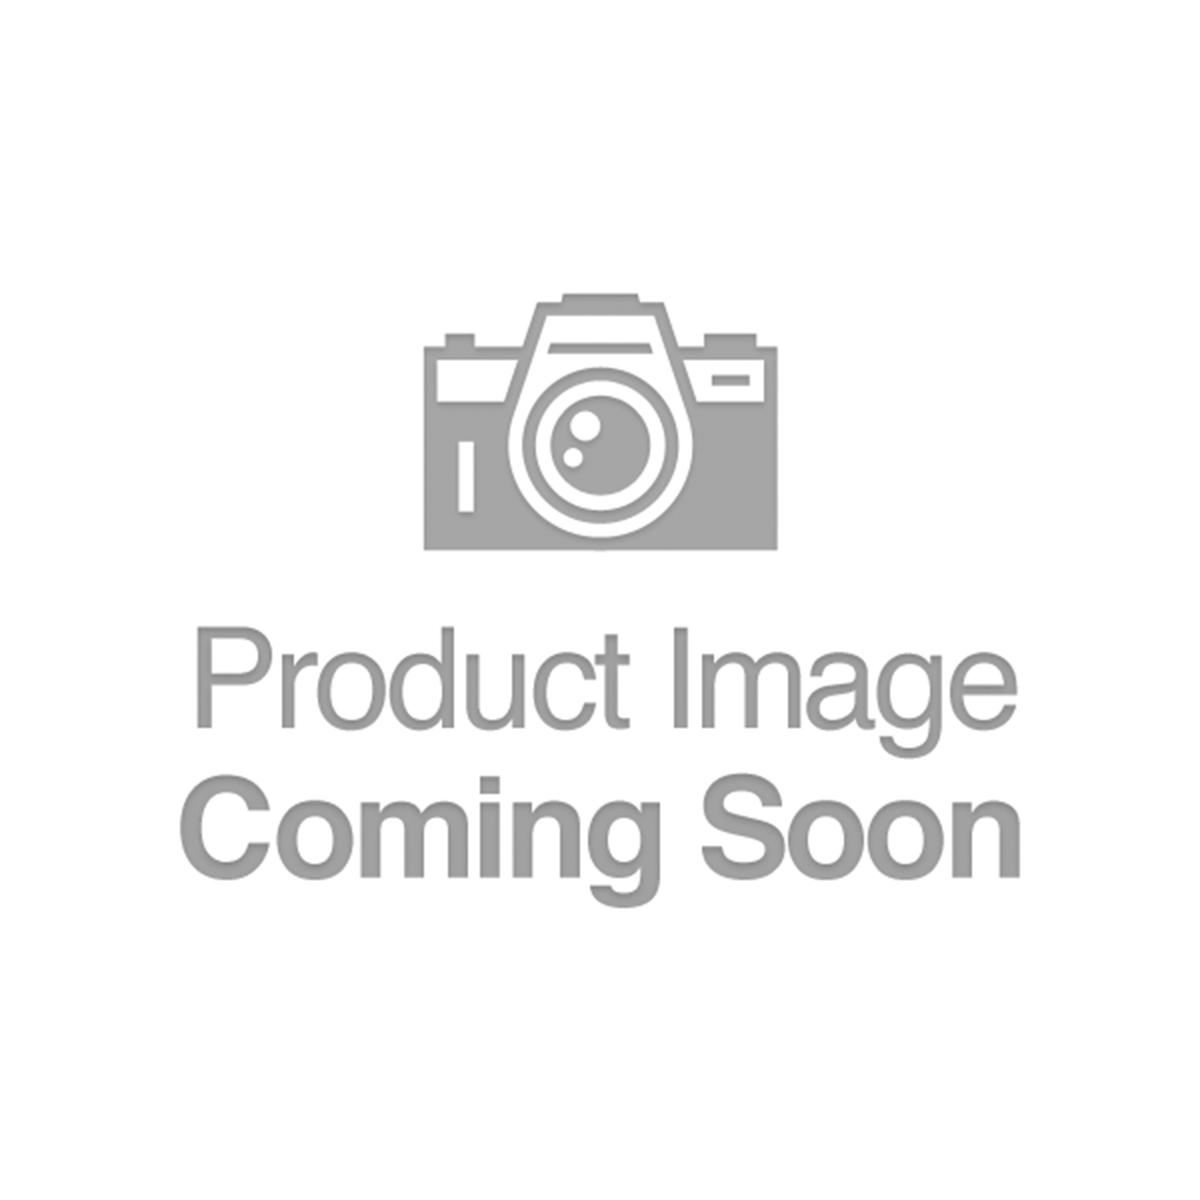 Mpc Series 641 10 Pmg 65epq Military Payment Certs Mpc